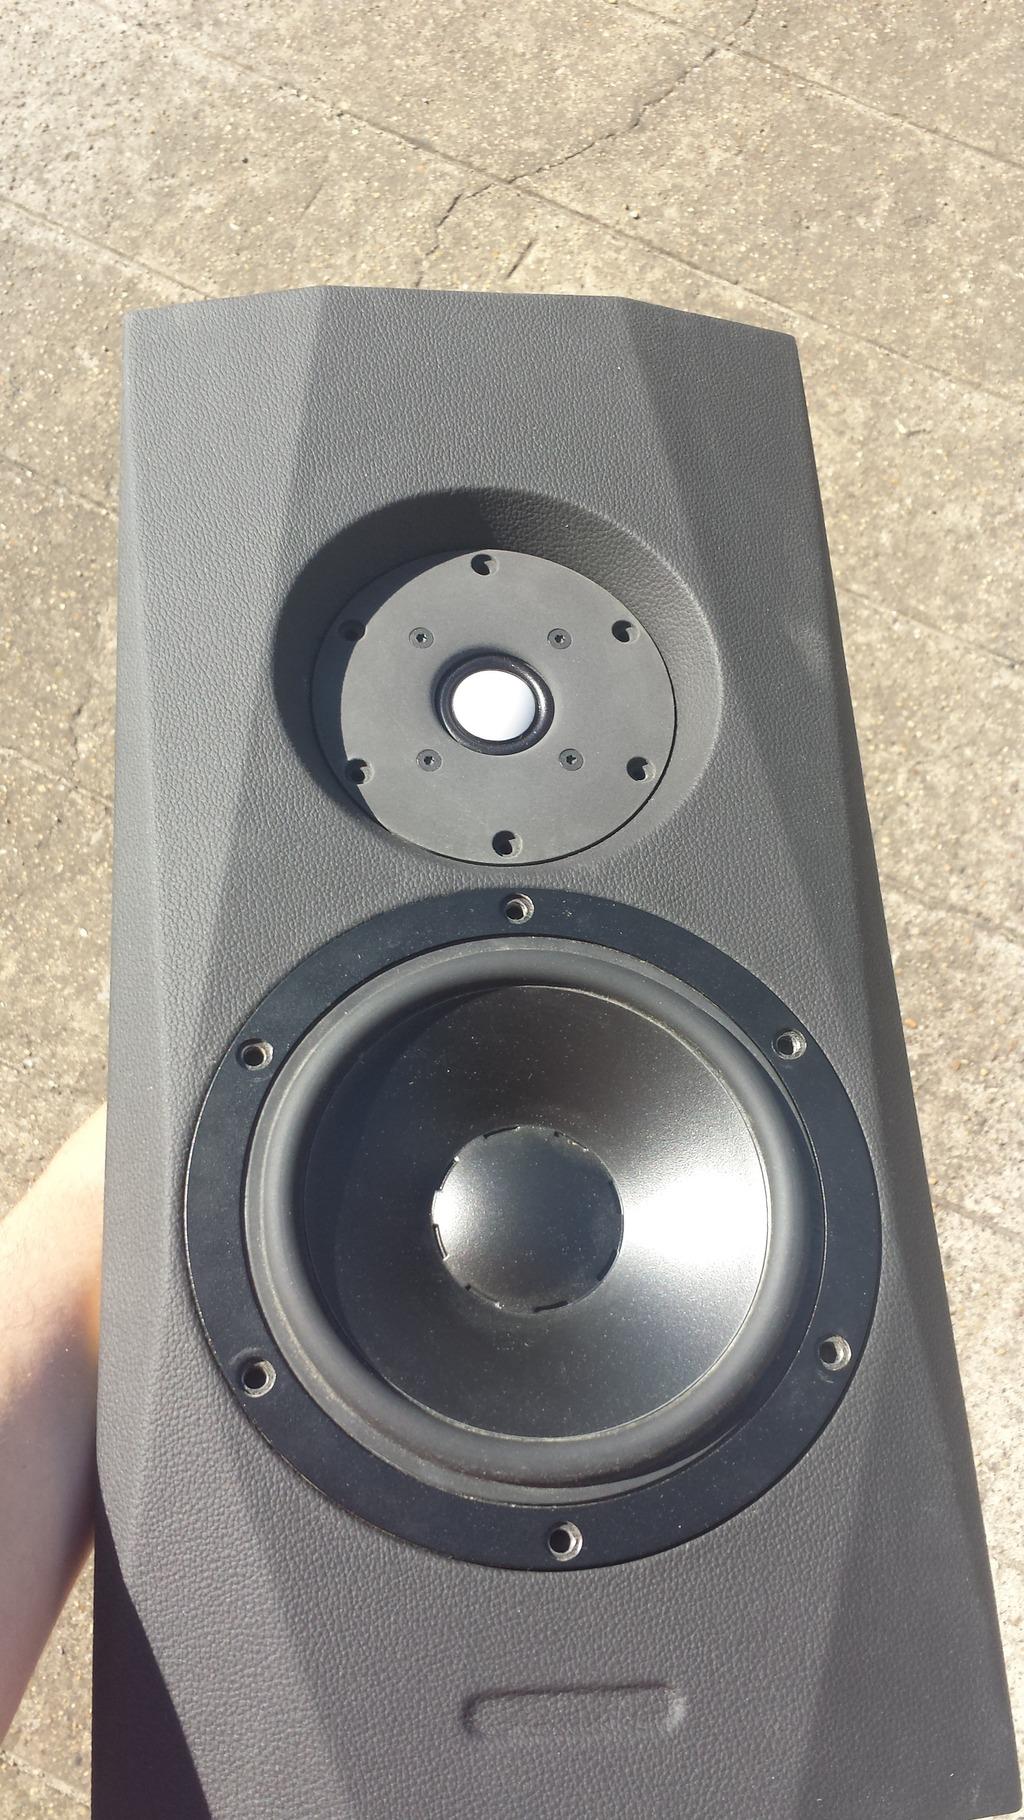 Monitores Audiotechnology C-Quenze 18H521706SD + Seas Excel T29MF001 - Página 6 2015-07-13%2010.43.32_zps4valg6sz